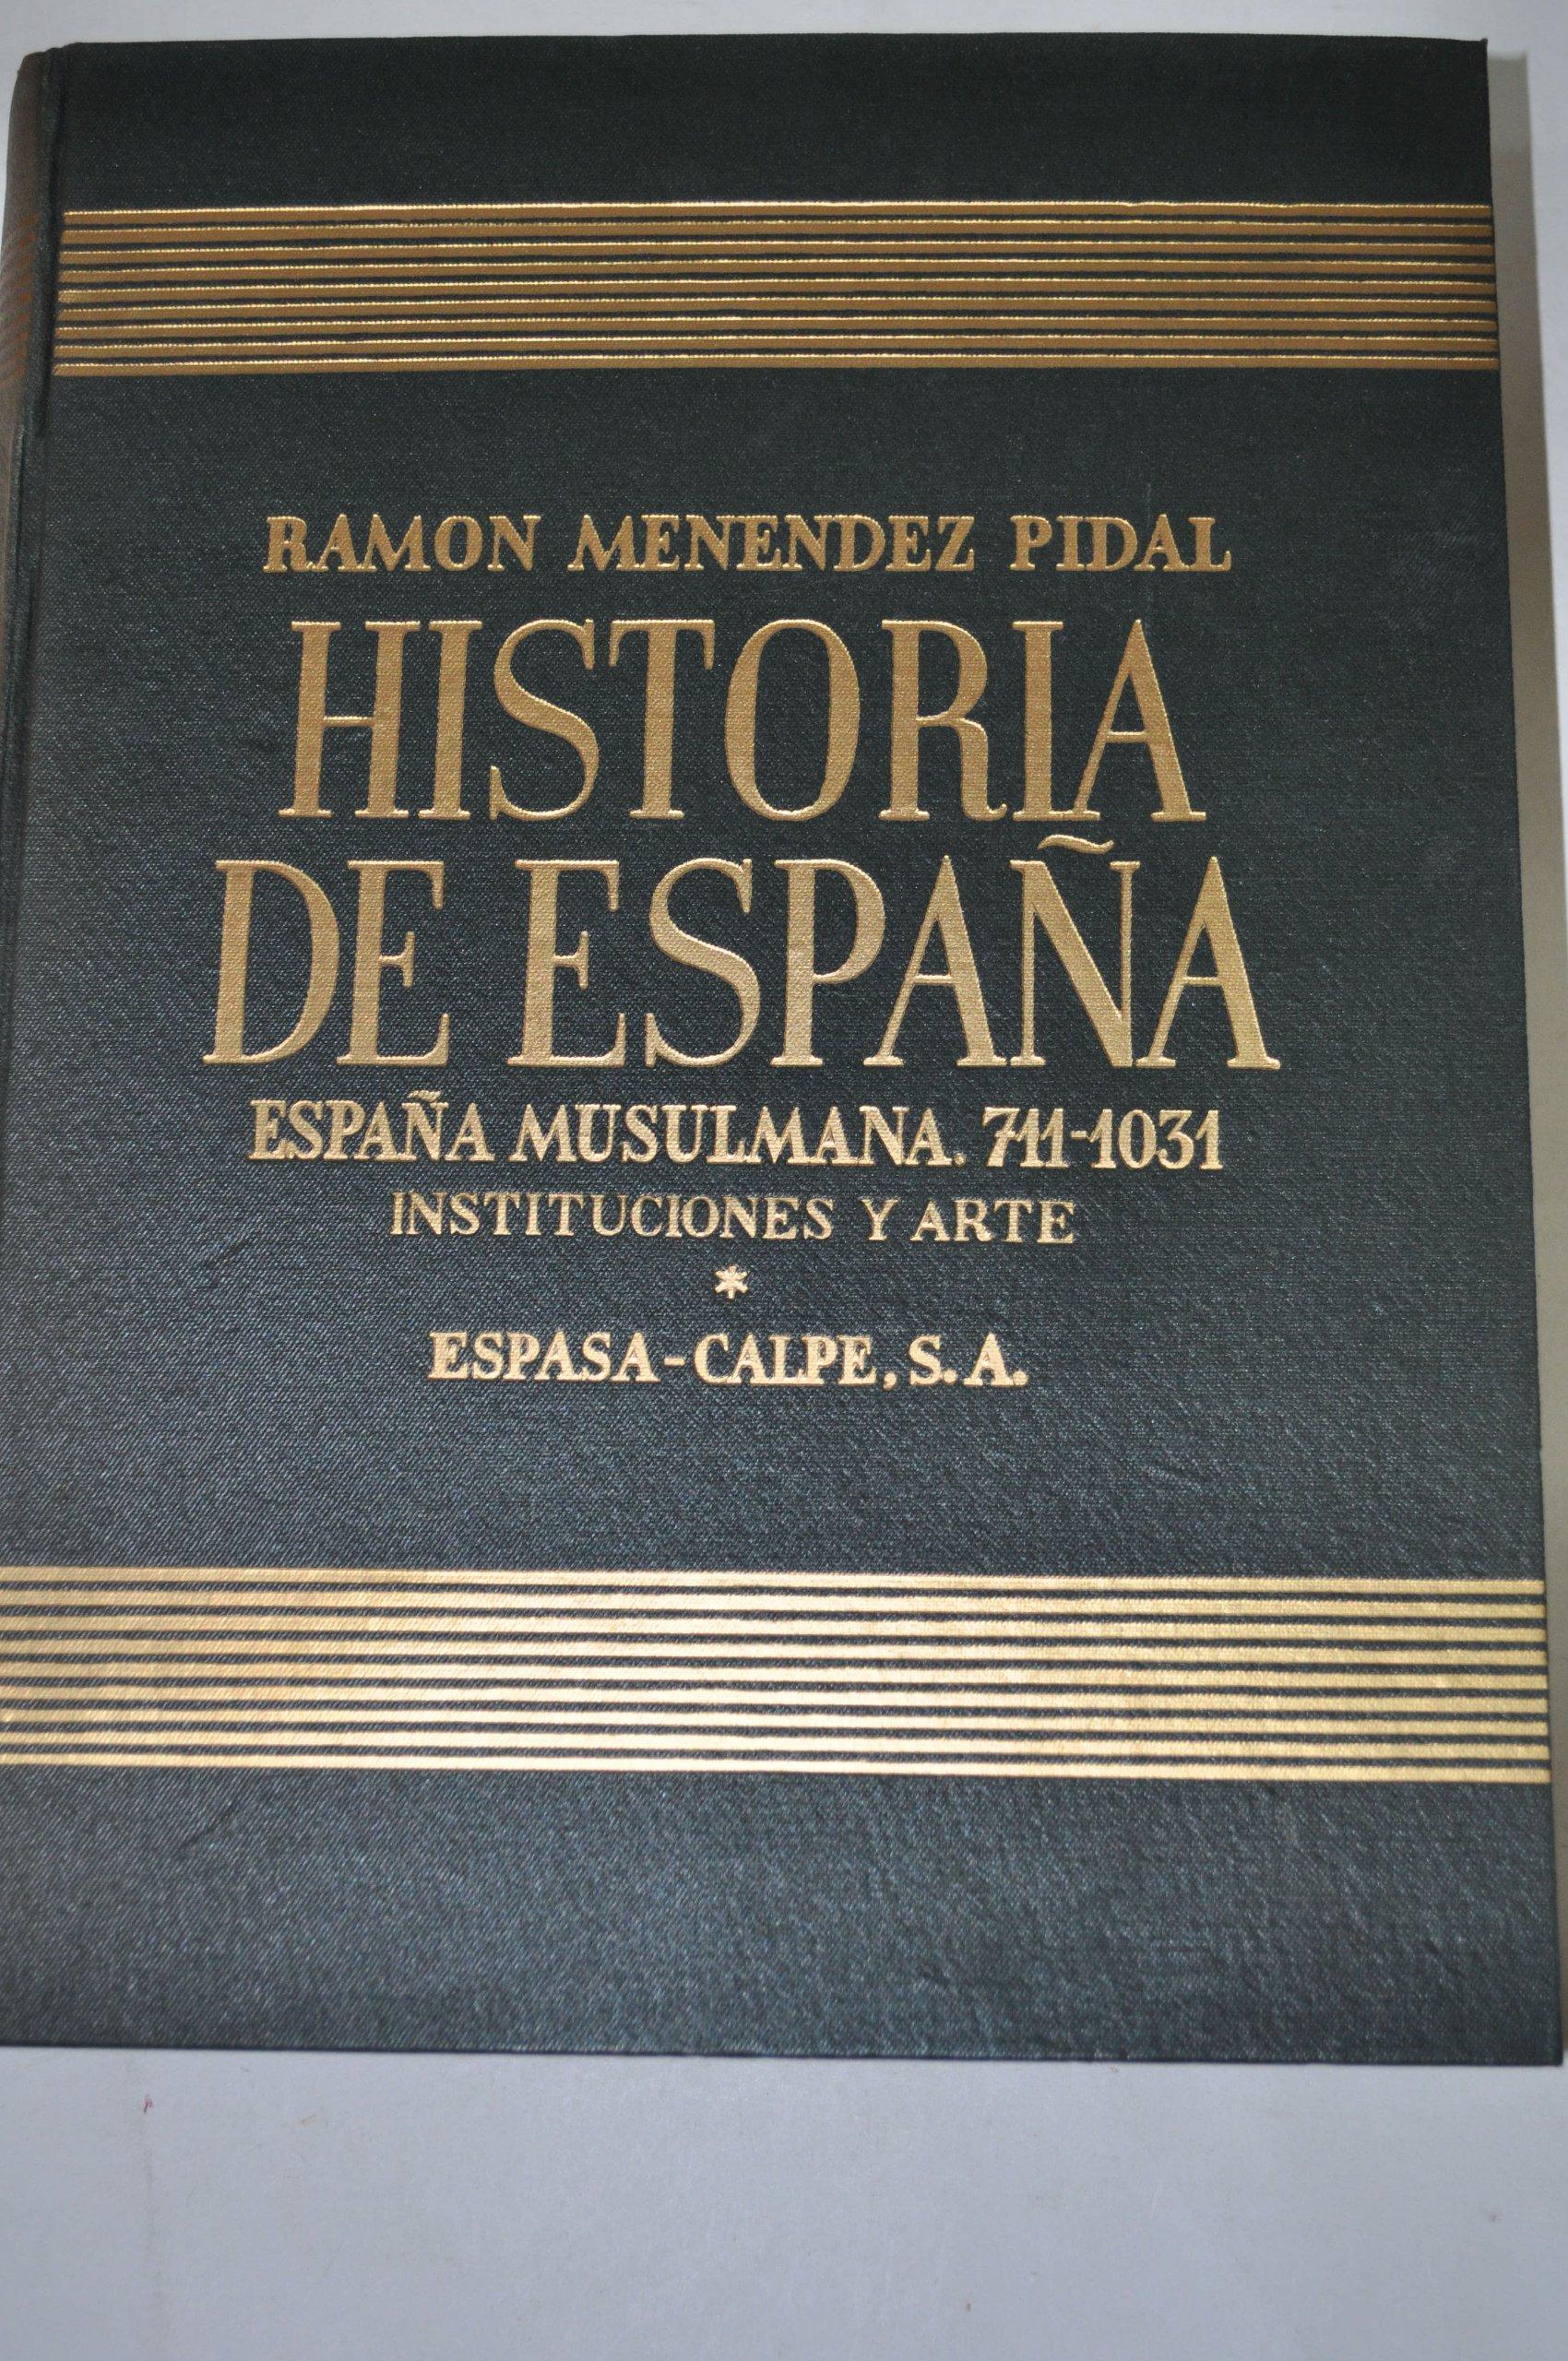 HISTORIA DE ESPAÑA. TOMO IV. ESPAÑA MUSULMANA HASTA LA CAÍDA DEL CALIFATO DE CÓRDOBA 711-1031 DE J. C. .: Amazon.es: LÉVI-PROVENÇAL, E.: Libros